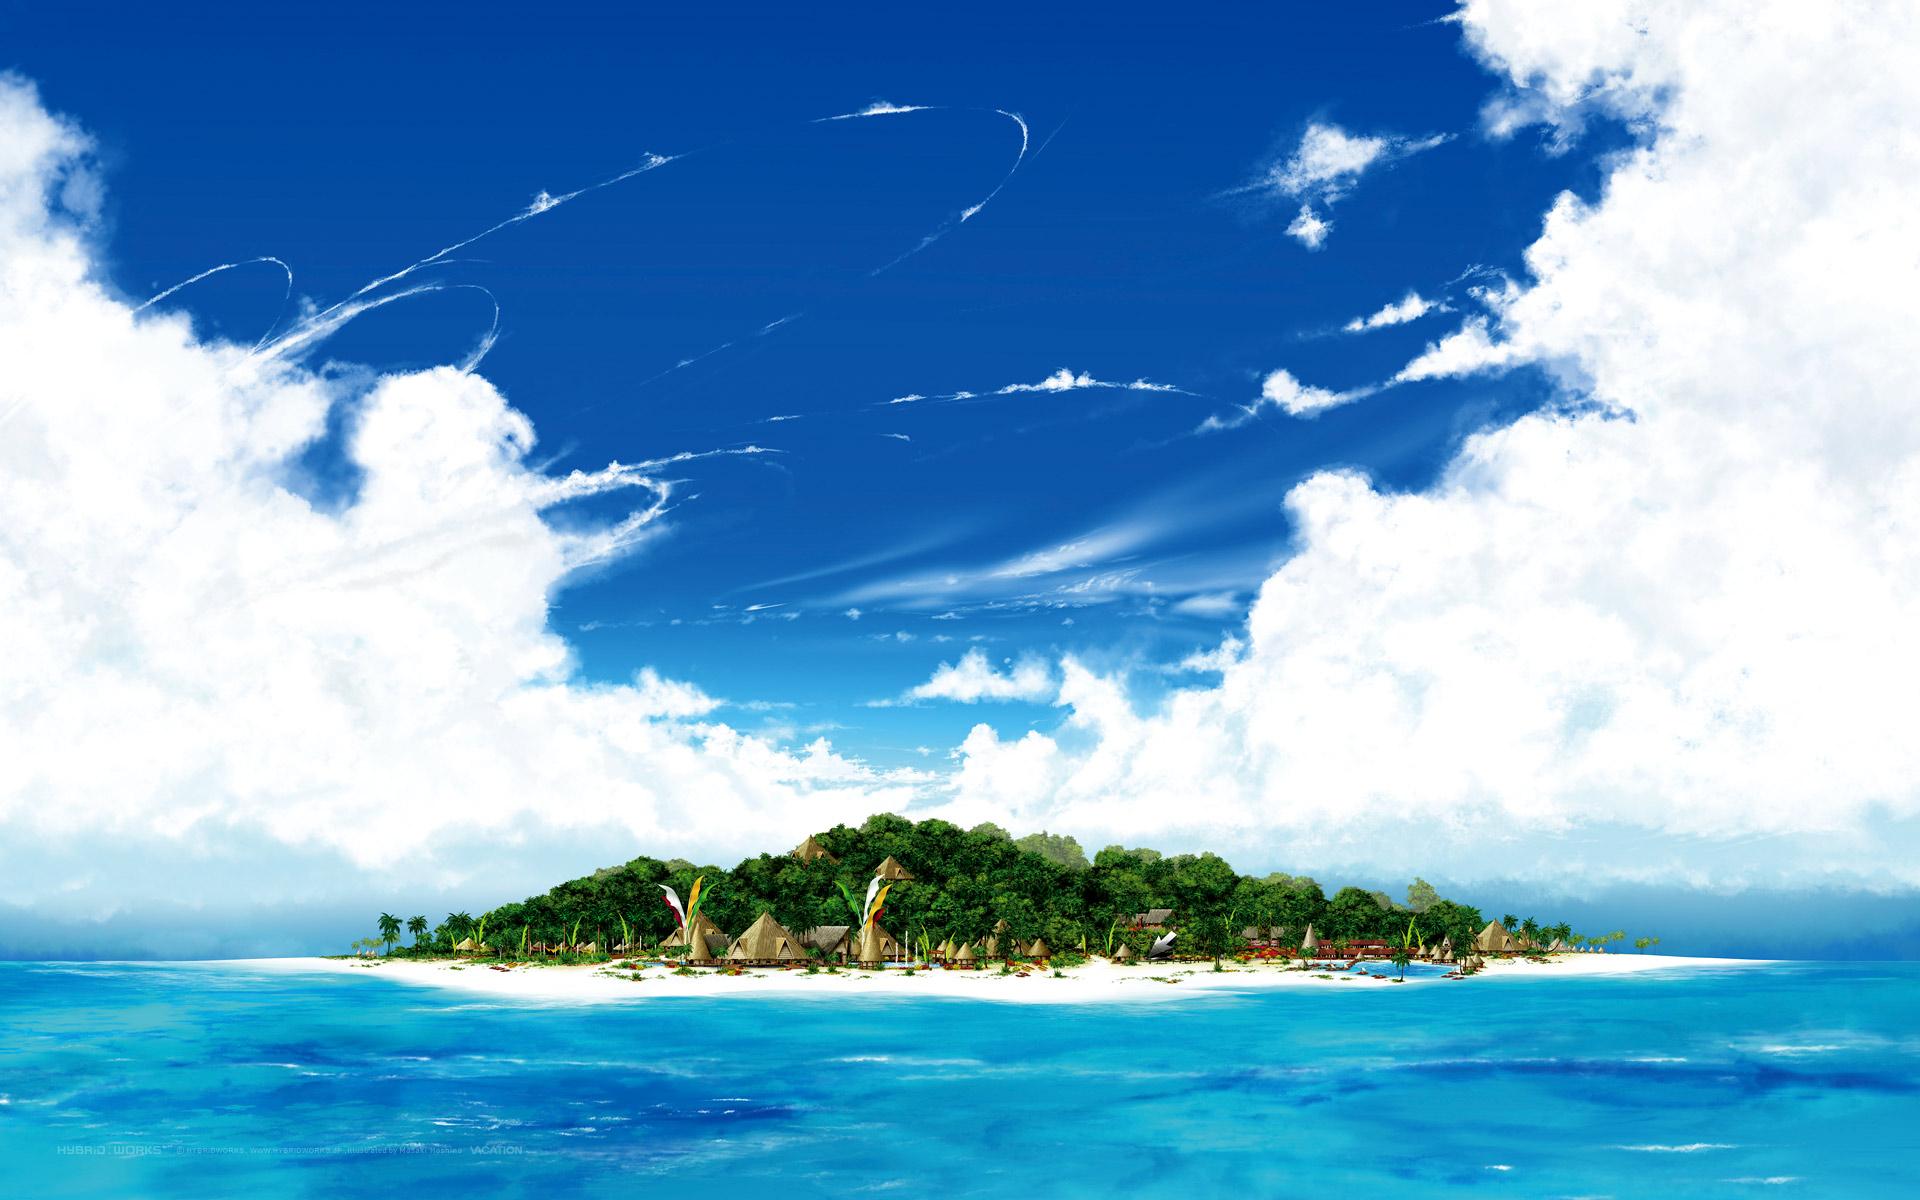 Desktop Vacation - Daytime